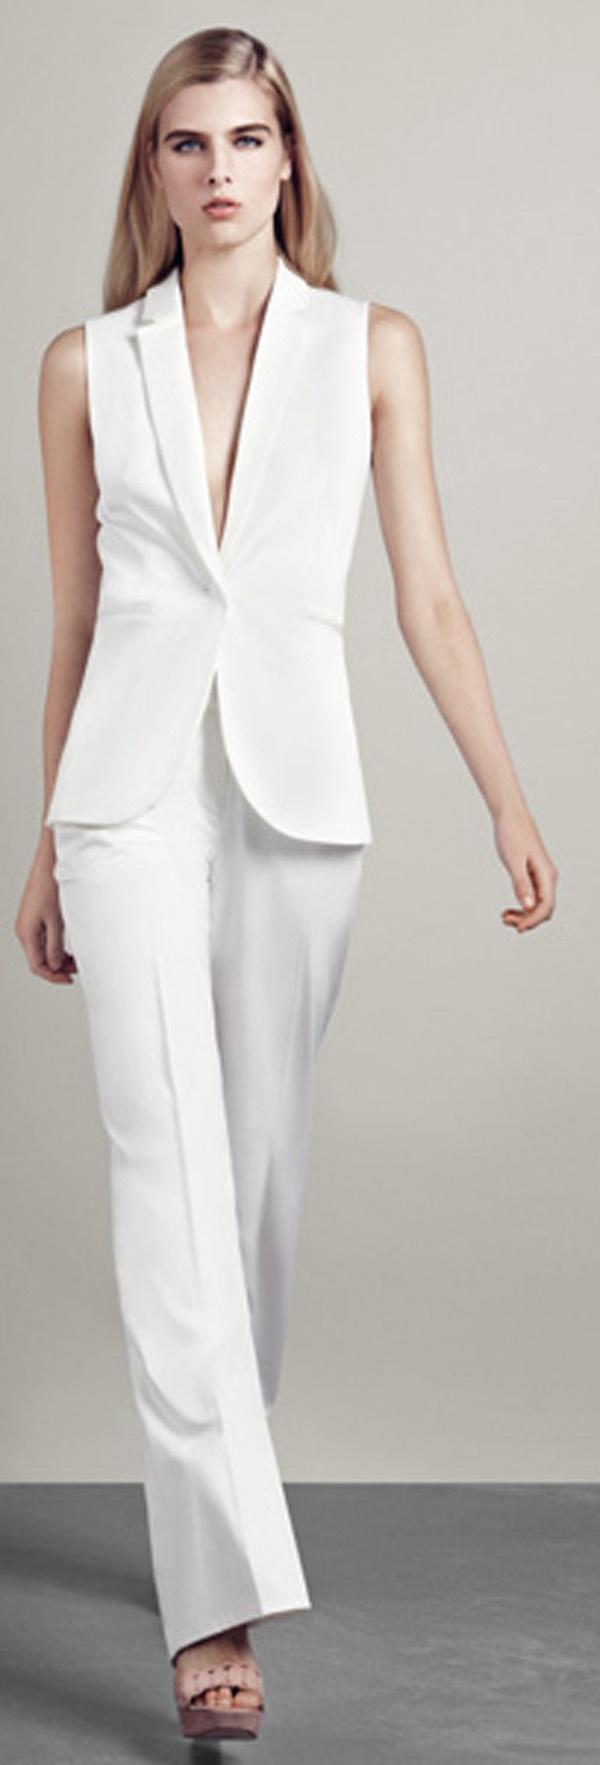 21 New White Pantsuit For Women U2013 Playzoa.com